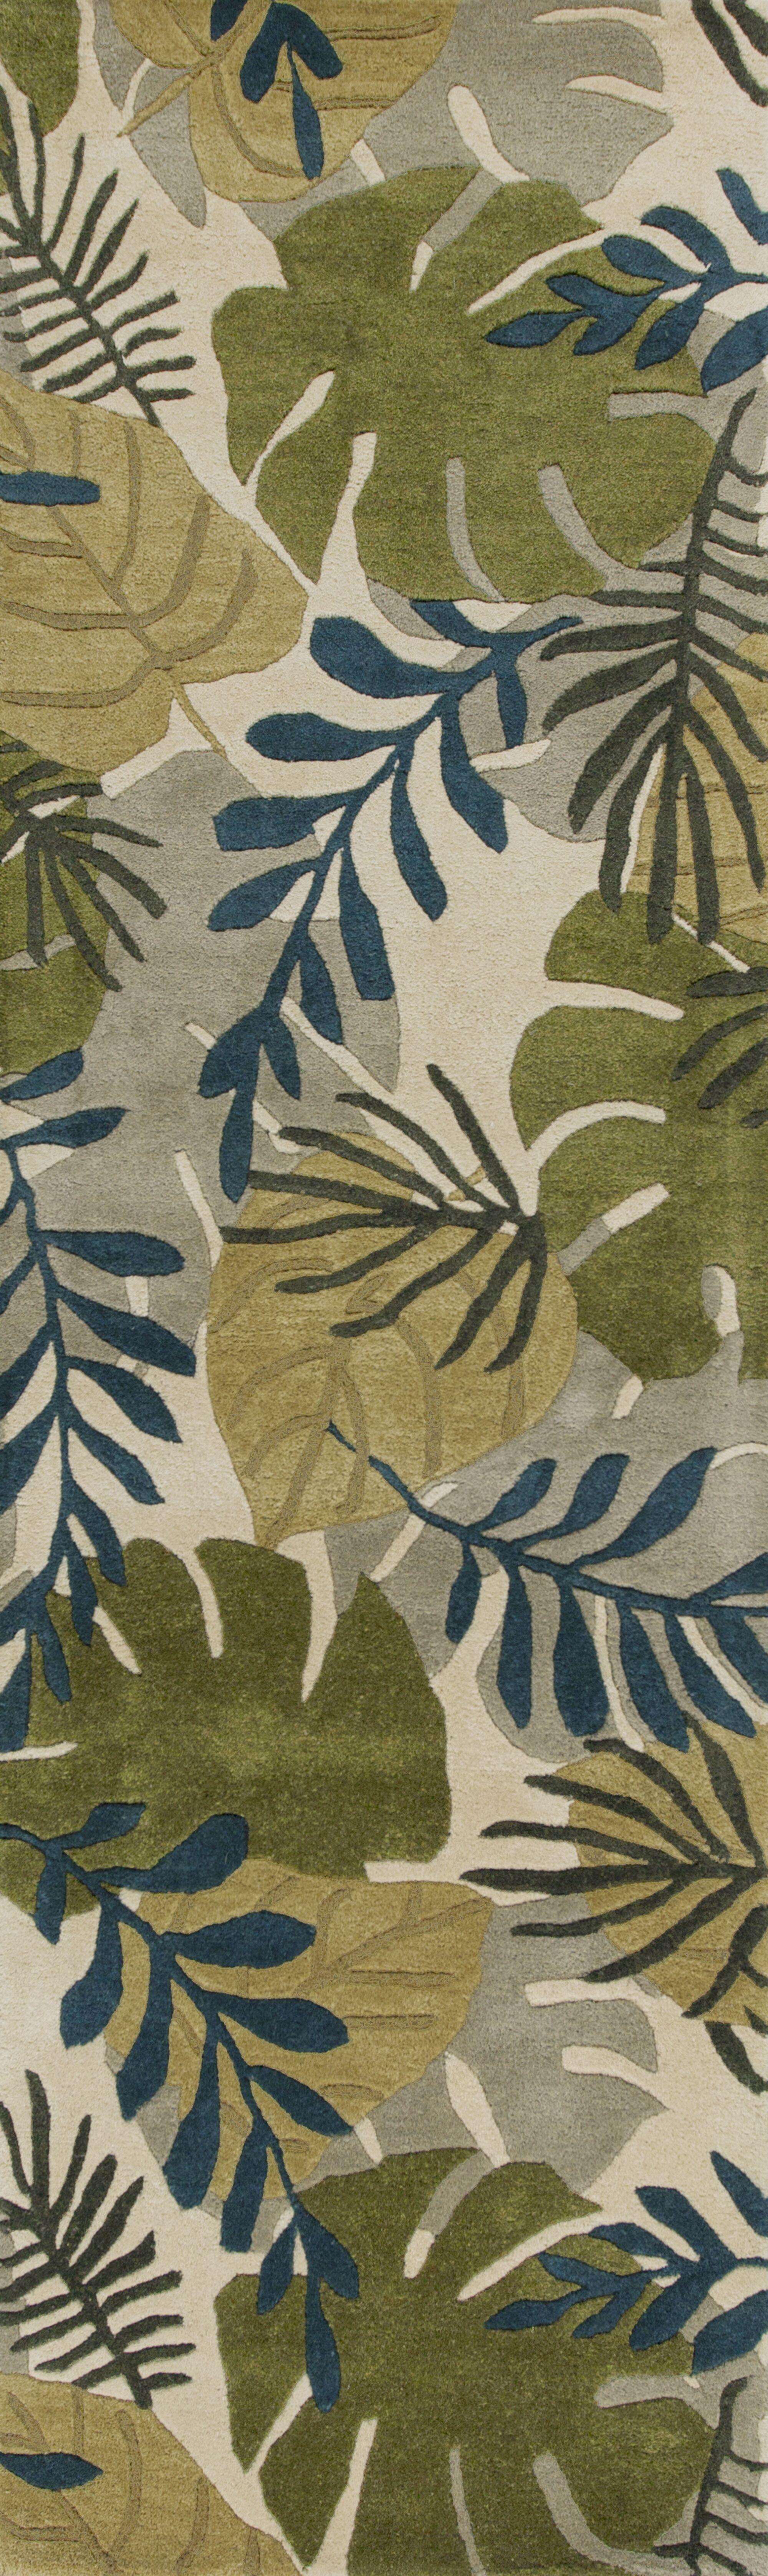 Imala Hand-Tufted Leaves Ivory Wool Area Rug Rug Size: Runner 2'3